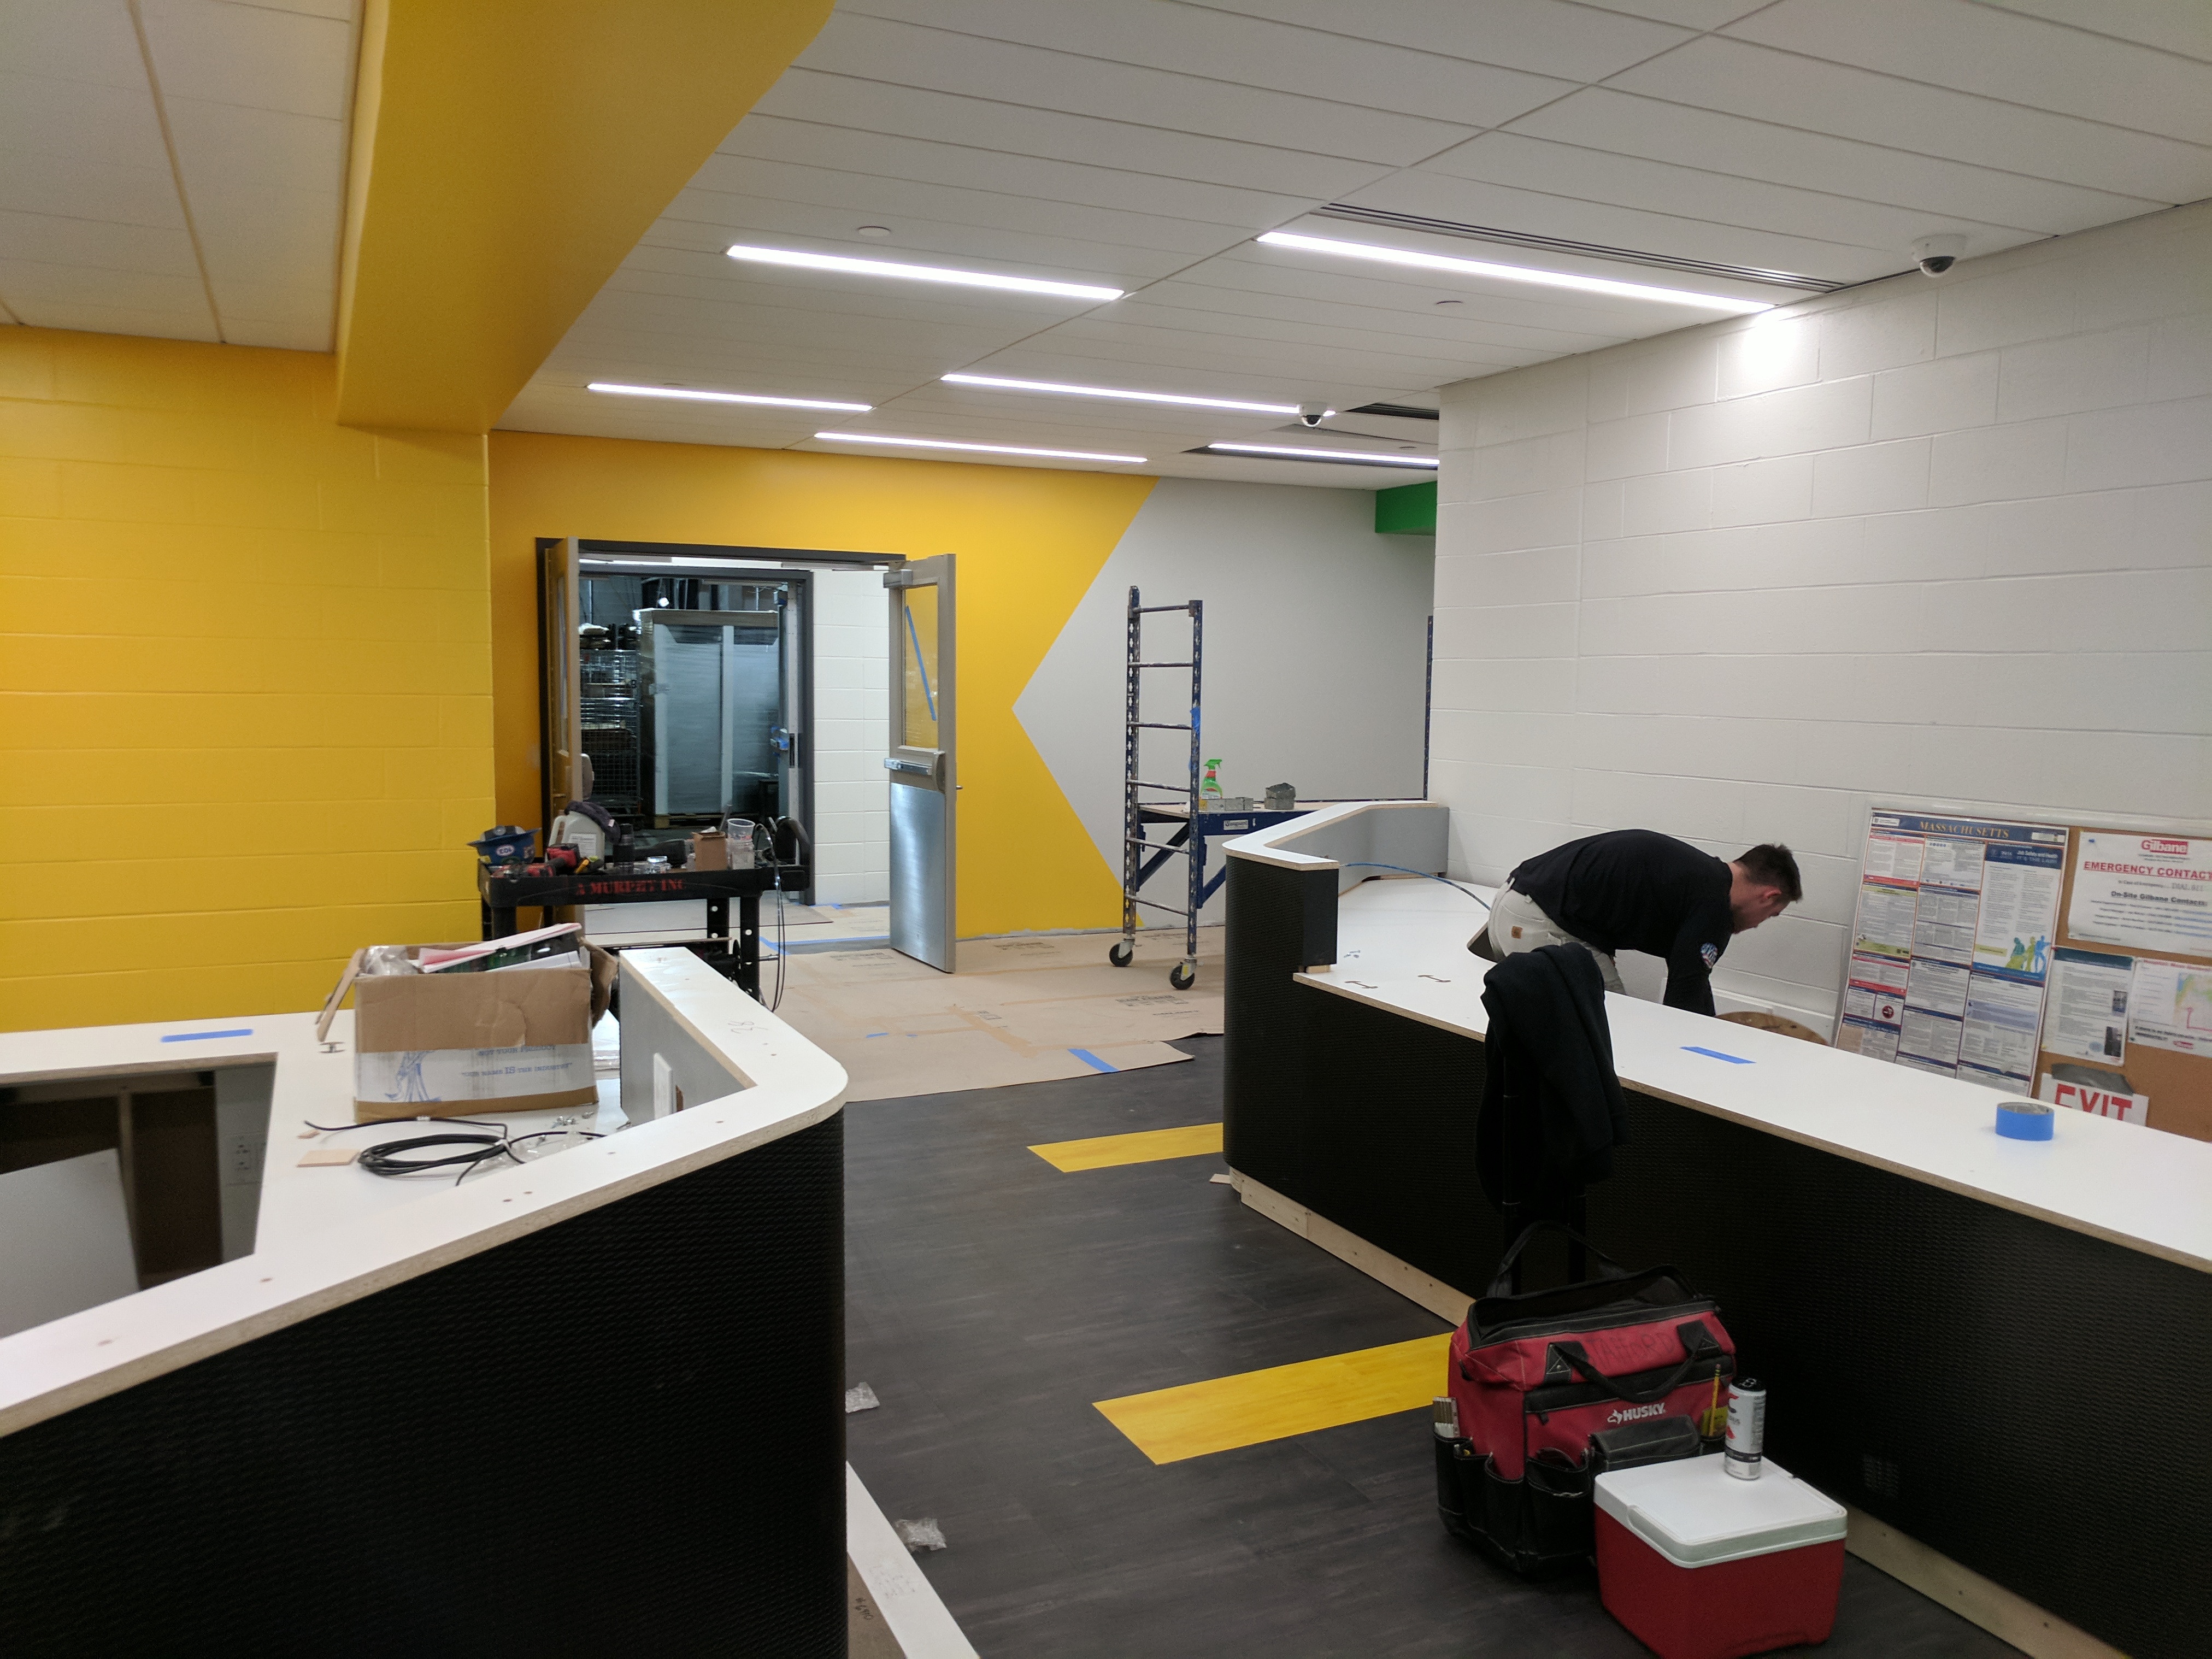 Construction of TD Garden - Tekstur Reception Desks